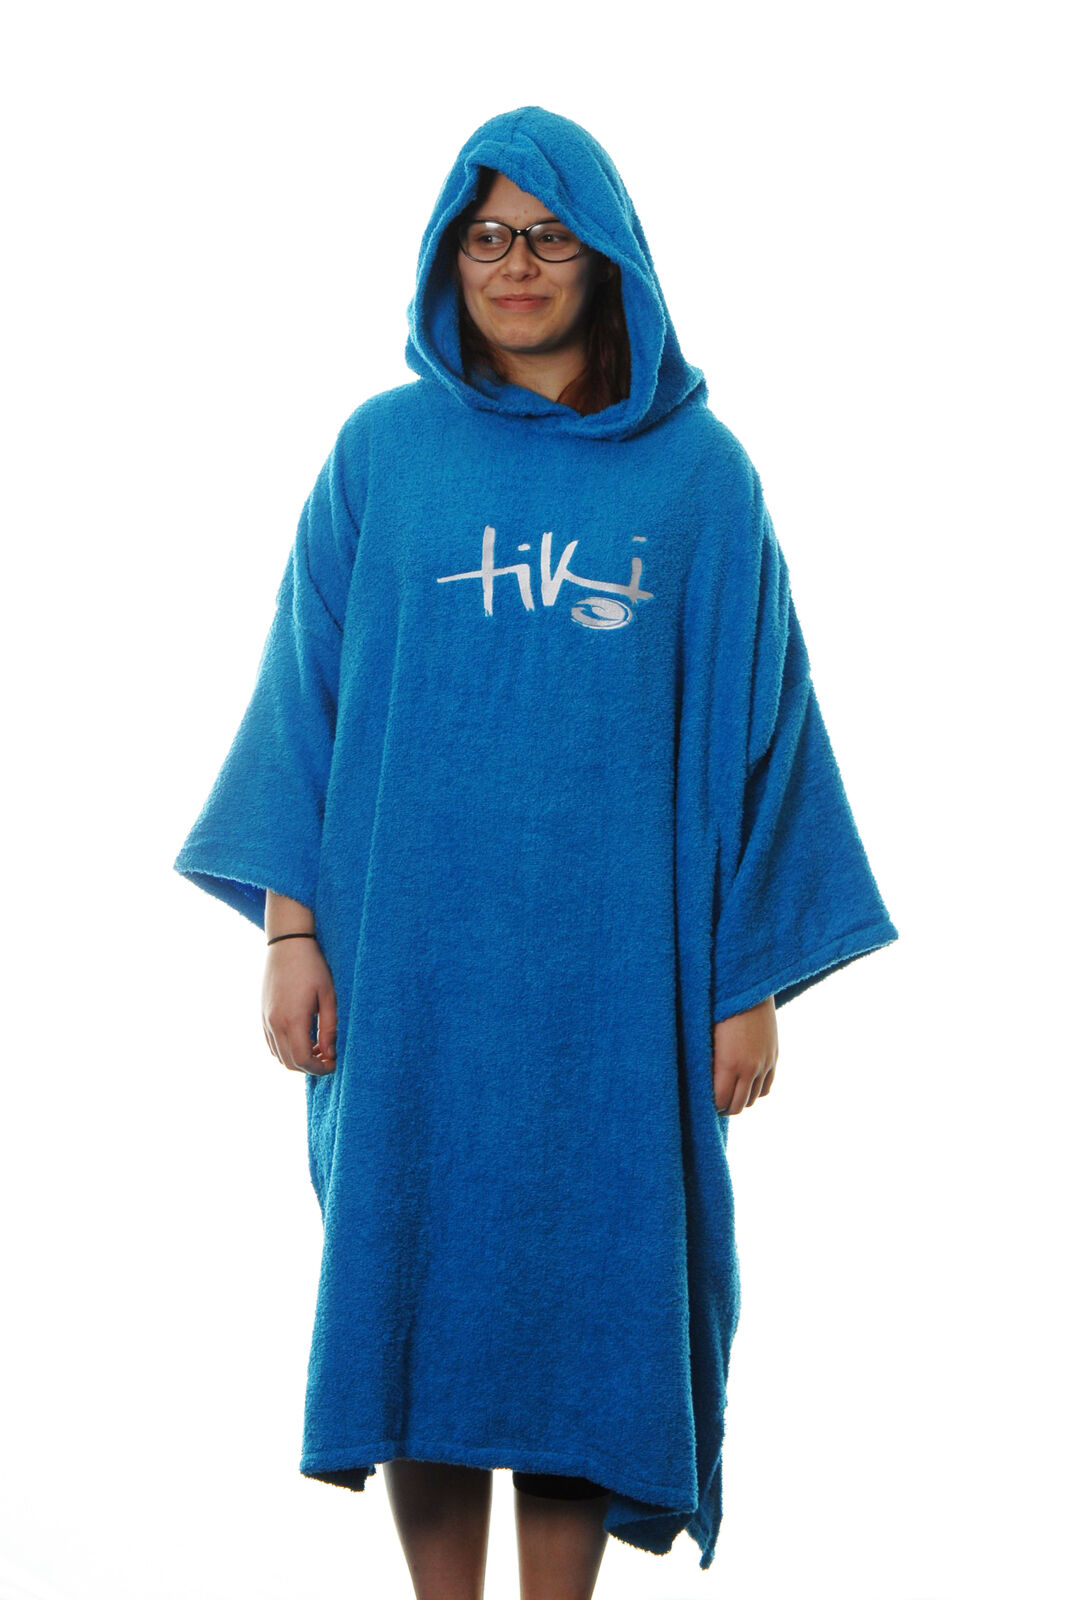 Tiki Adult Mens Womens Hooded Towelling Changing Robe Beach Swim Poncho bluee